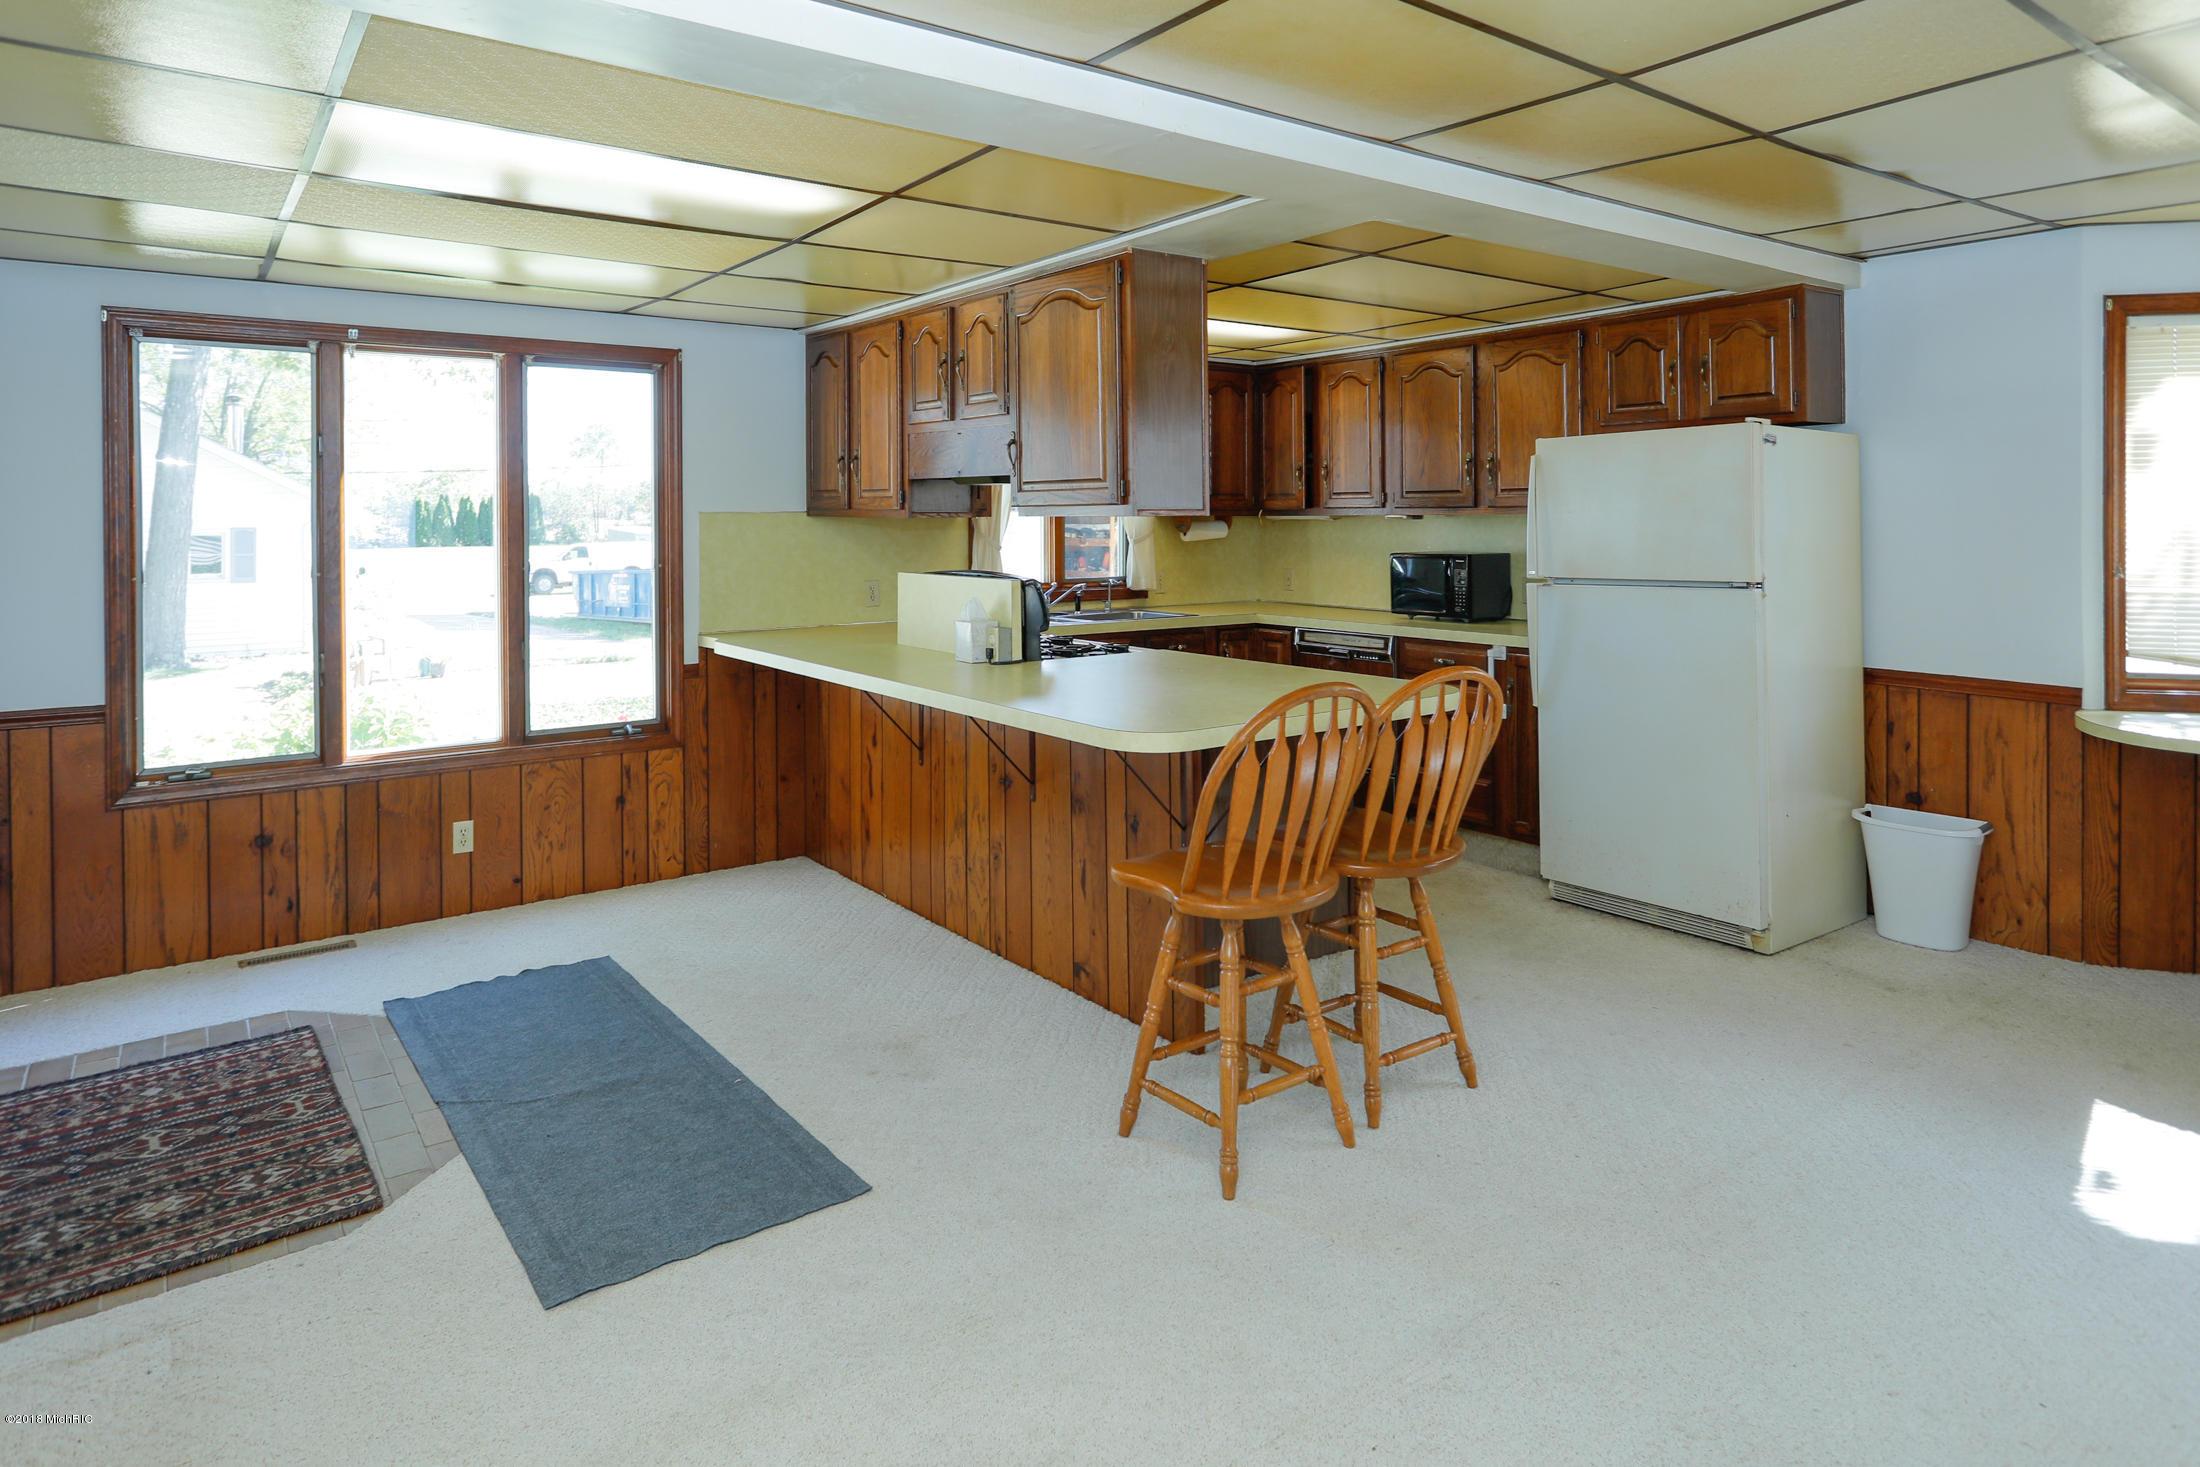 8842 E Long Lake , Scotts, MI 49088 Photo 12